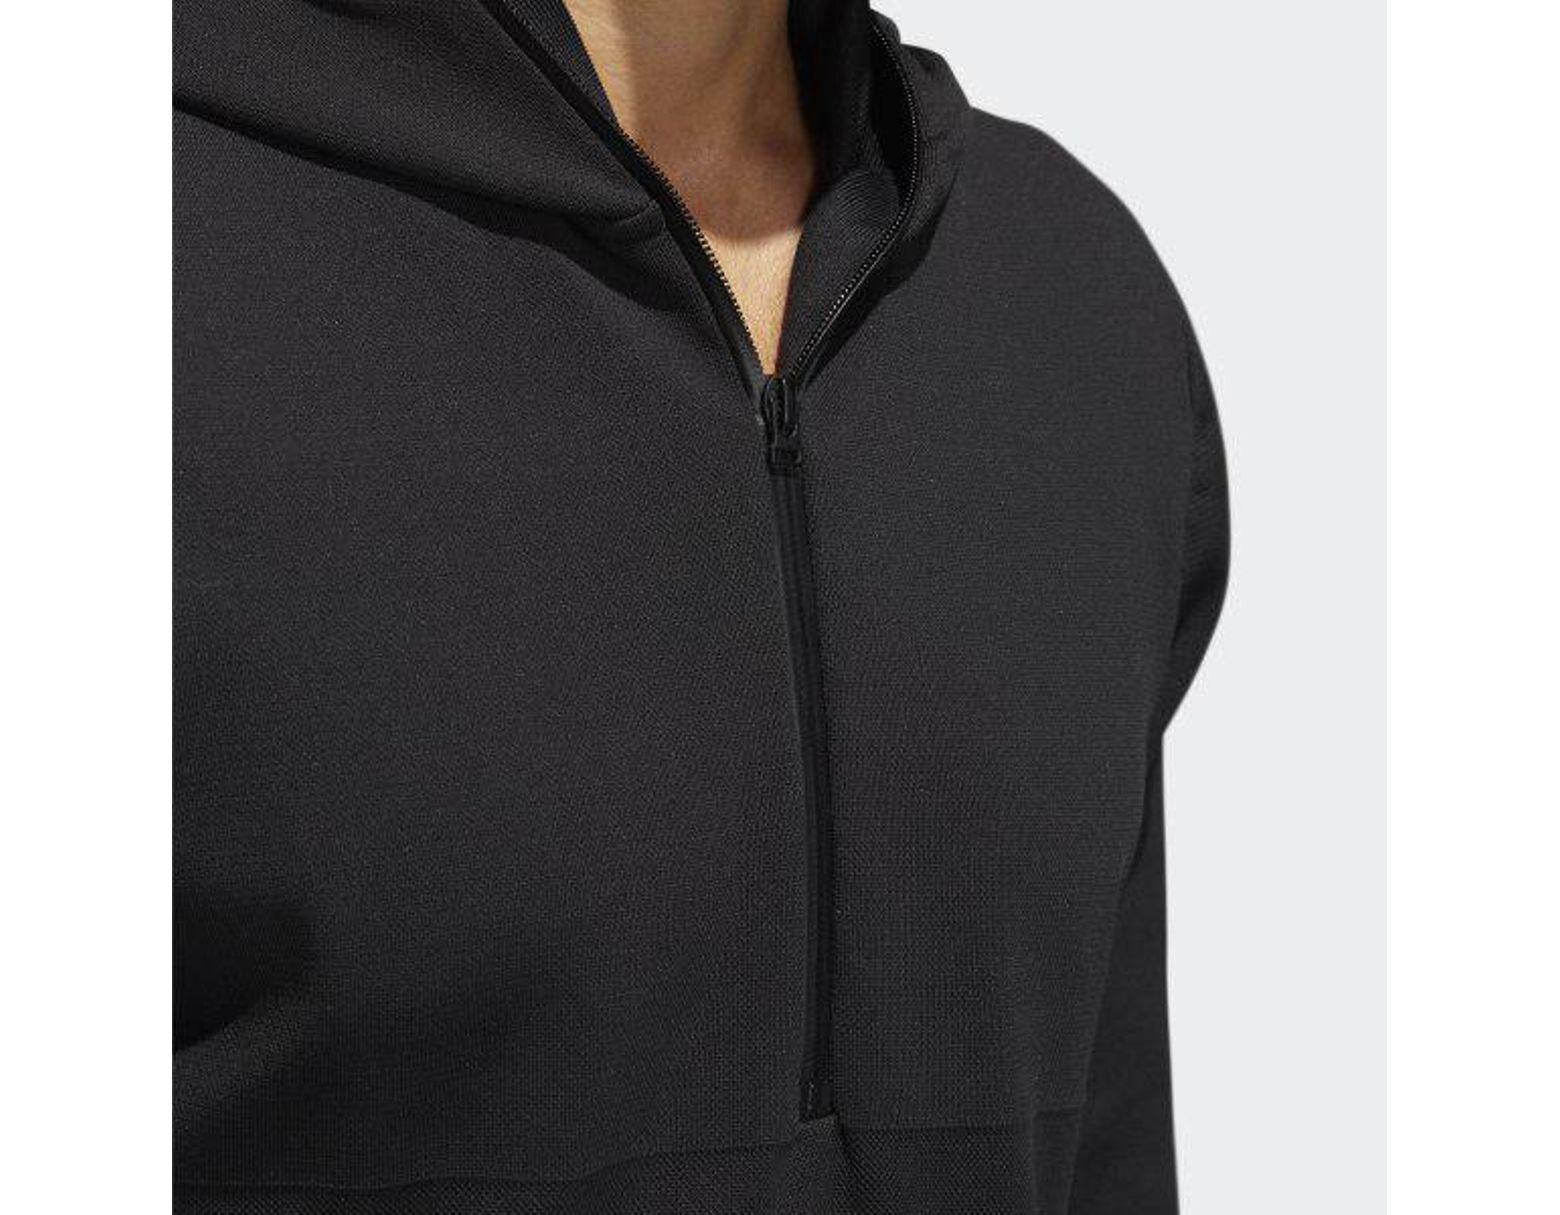 7a6ec25969 Men's Black Adicross Primeknit Parka Hooded Jacket